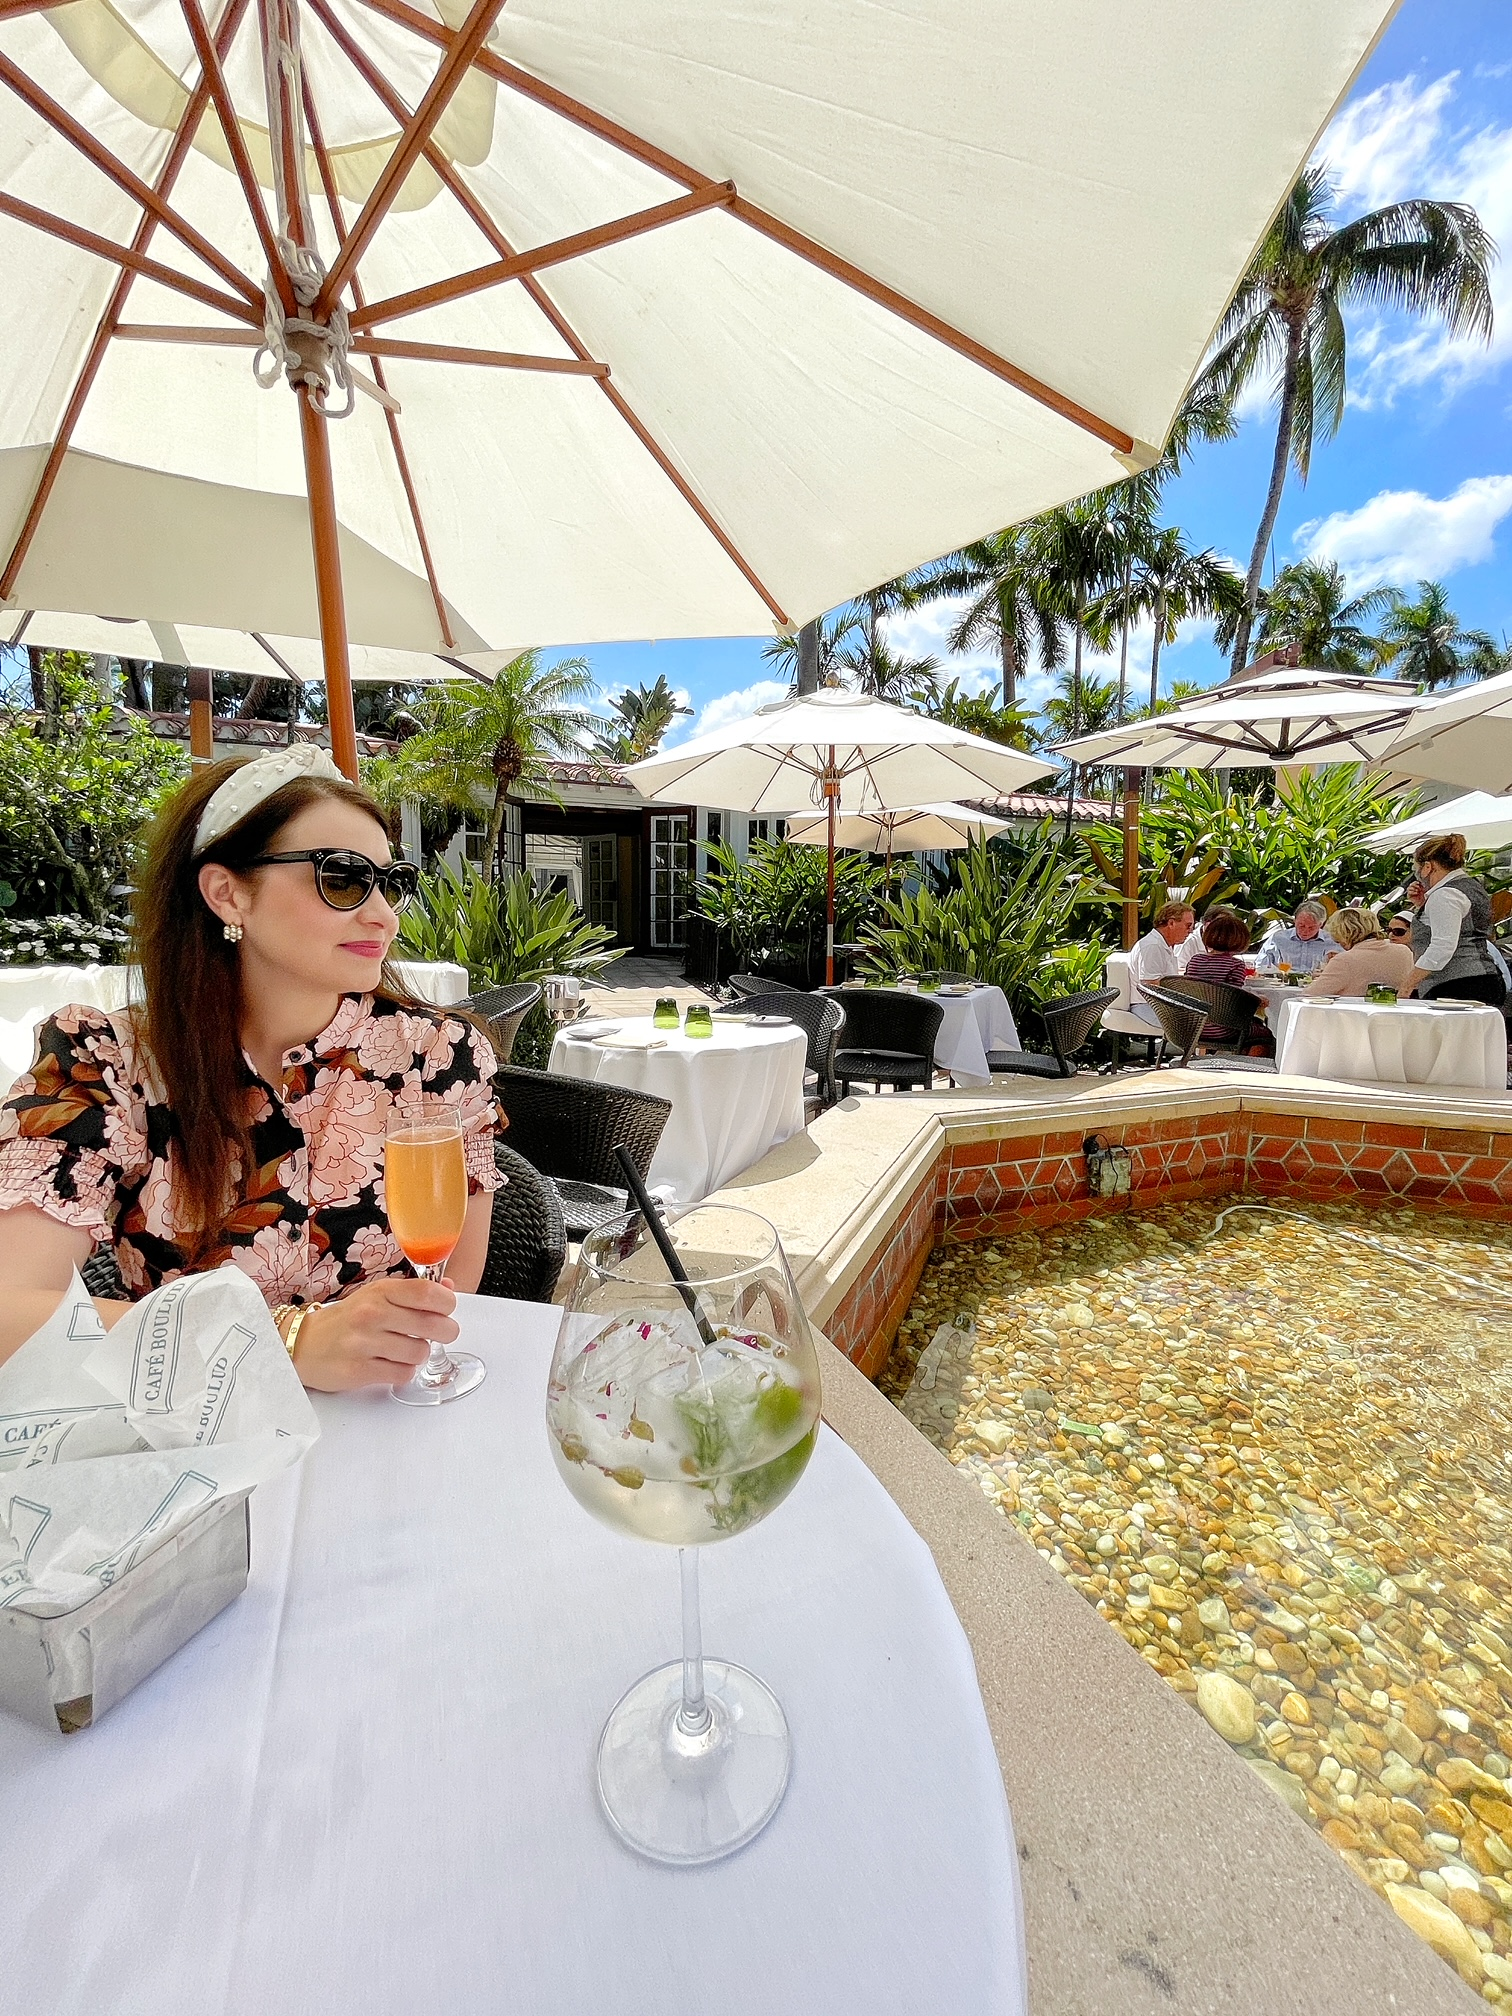 cafe boulud palm beach, the-alyst.com